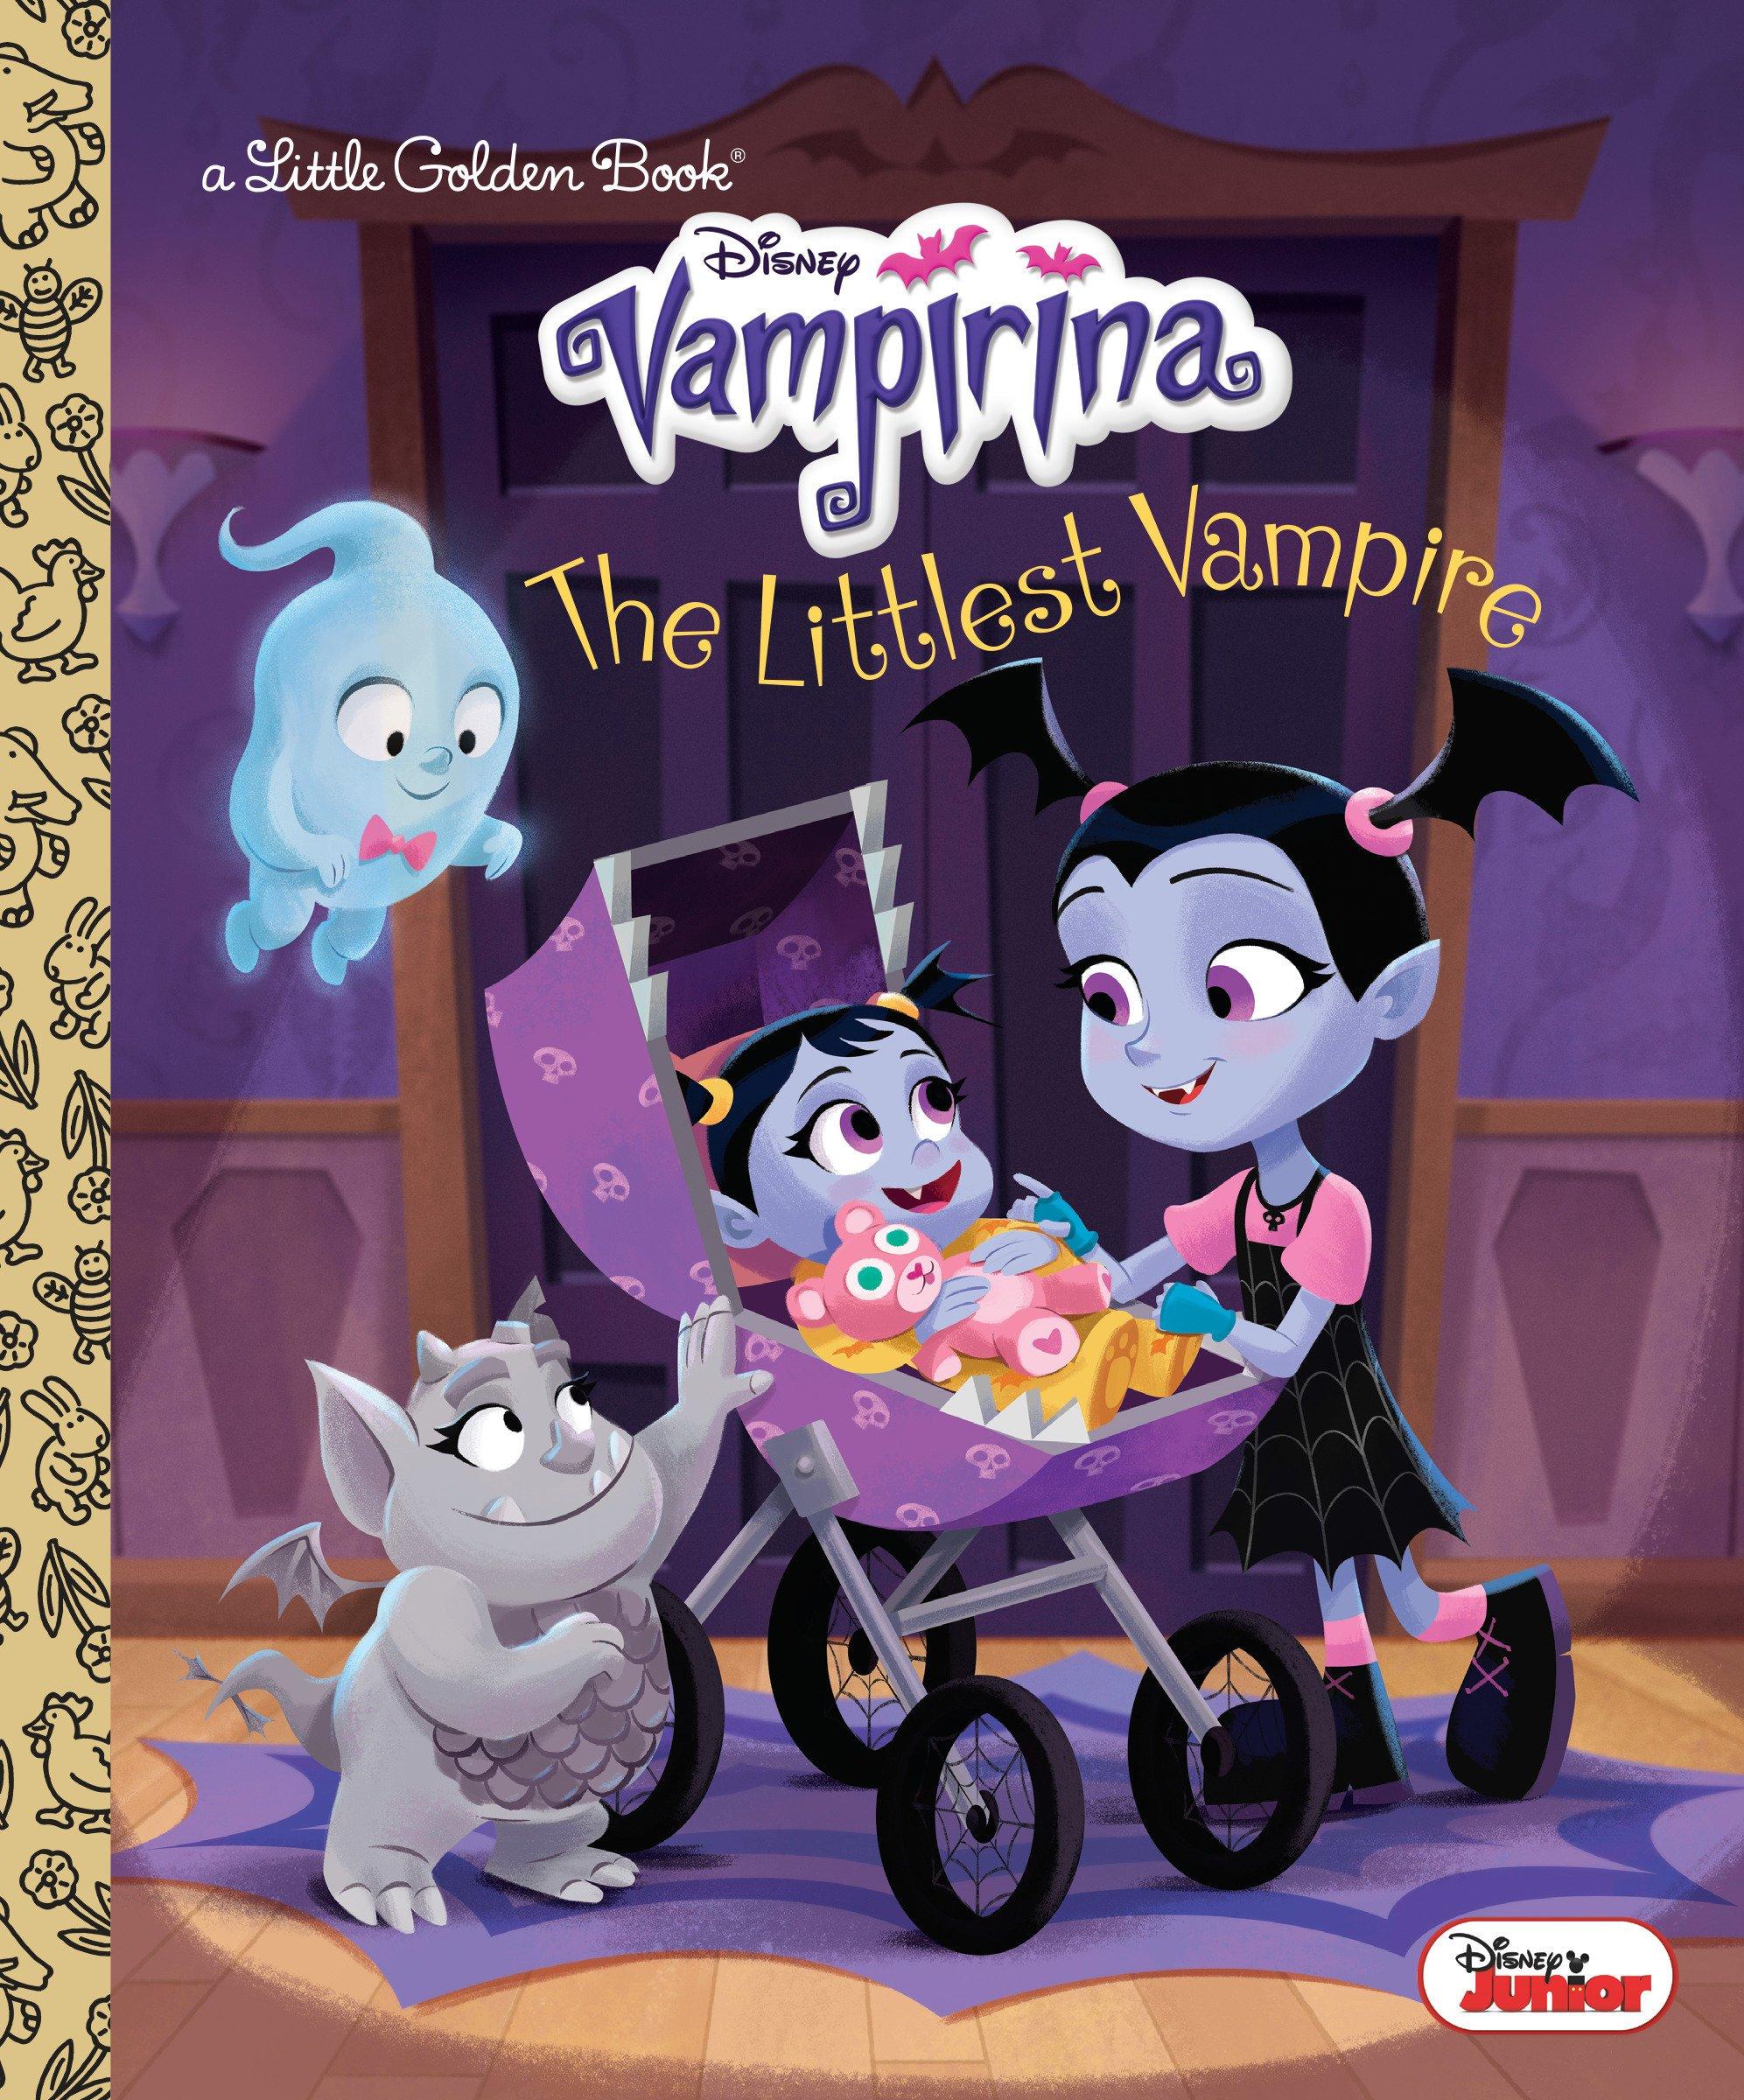 The Littlest Vampire (Disney Junior Vampirina) (Little Golden Book) pdf